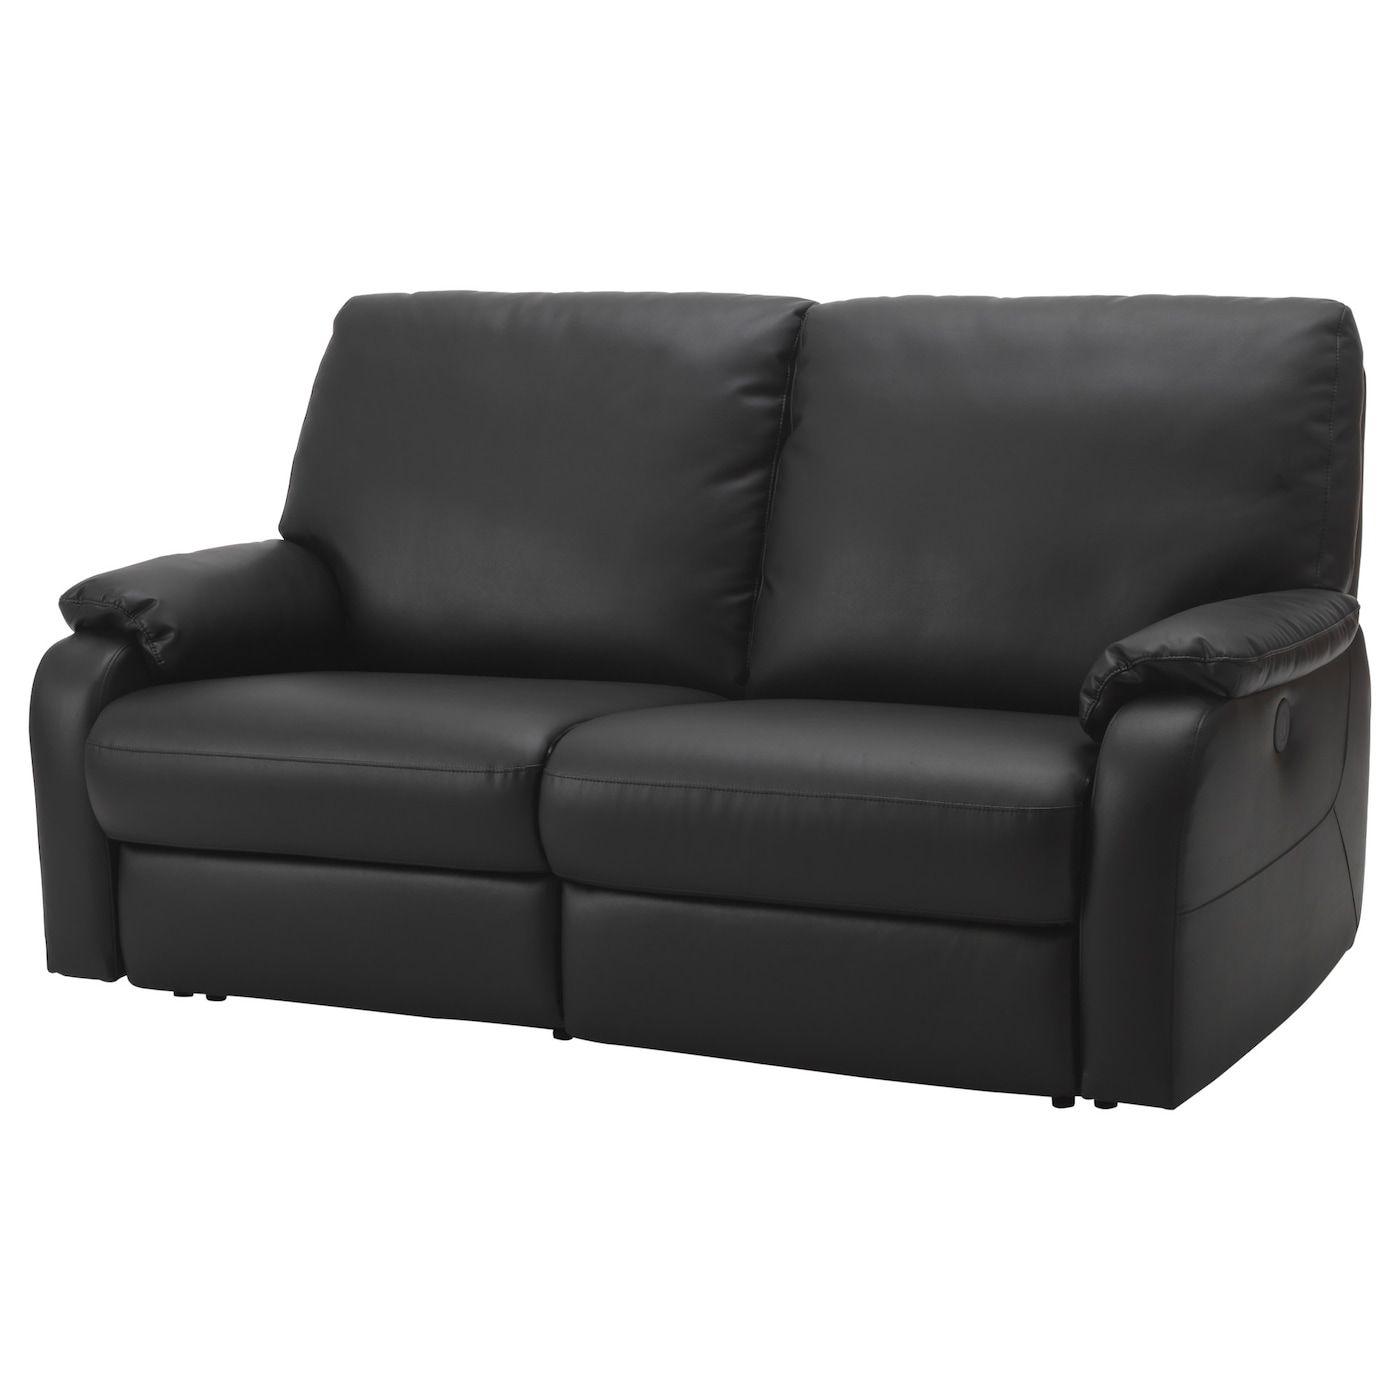 Tomback Sofa With Adjustable Seat Back Kimstad Black Ikea Leather Sofa Bed Black Leather Sofas Best Leather Sofa